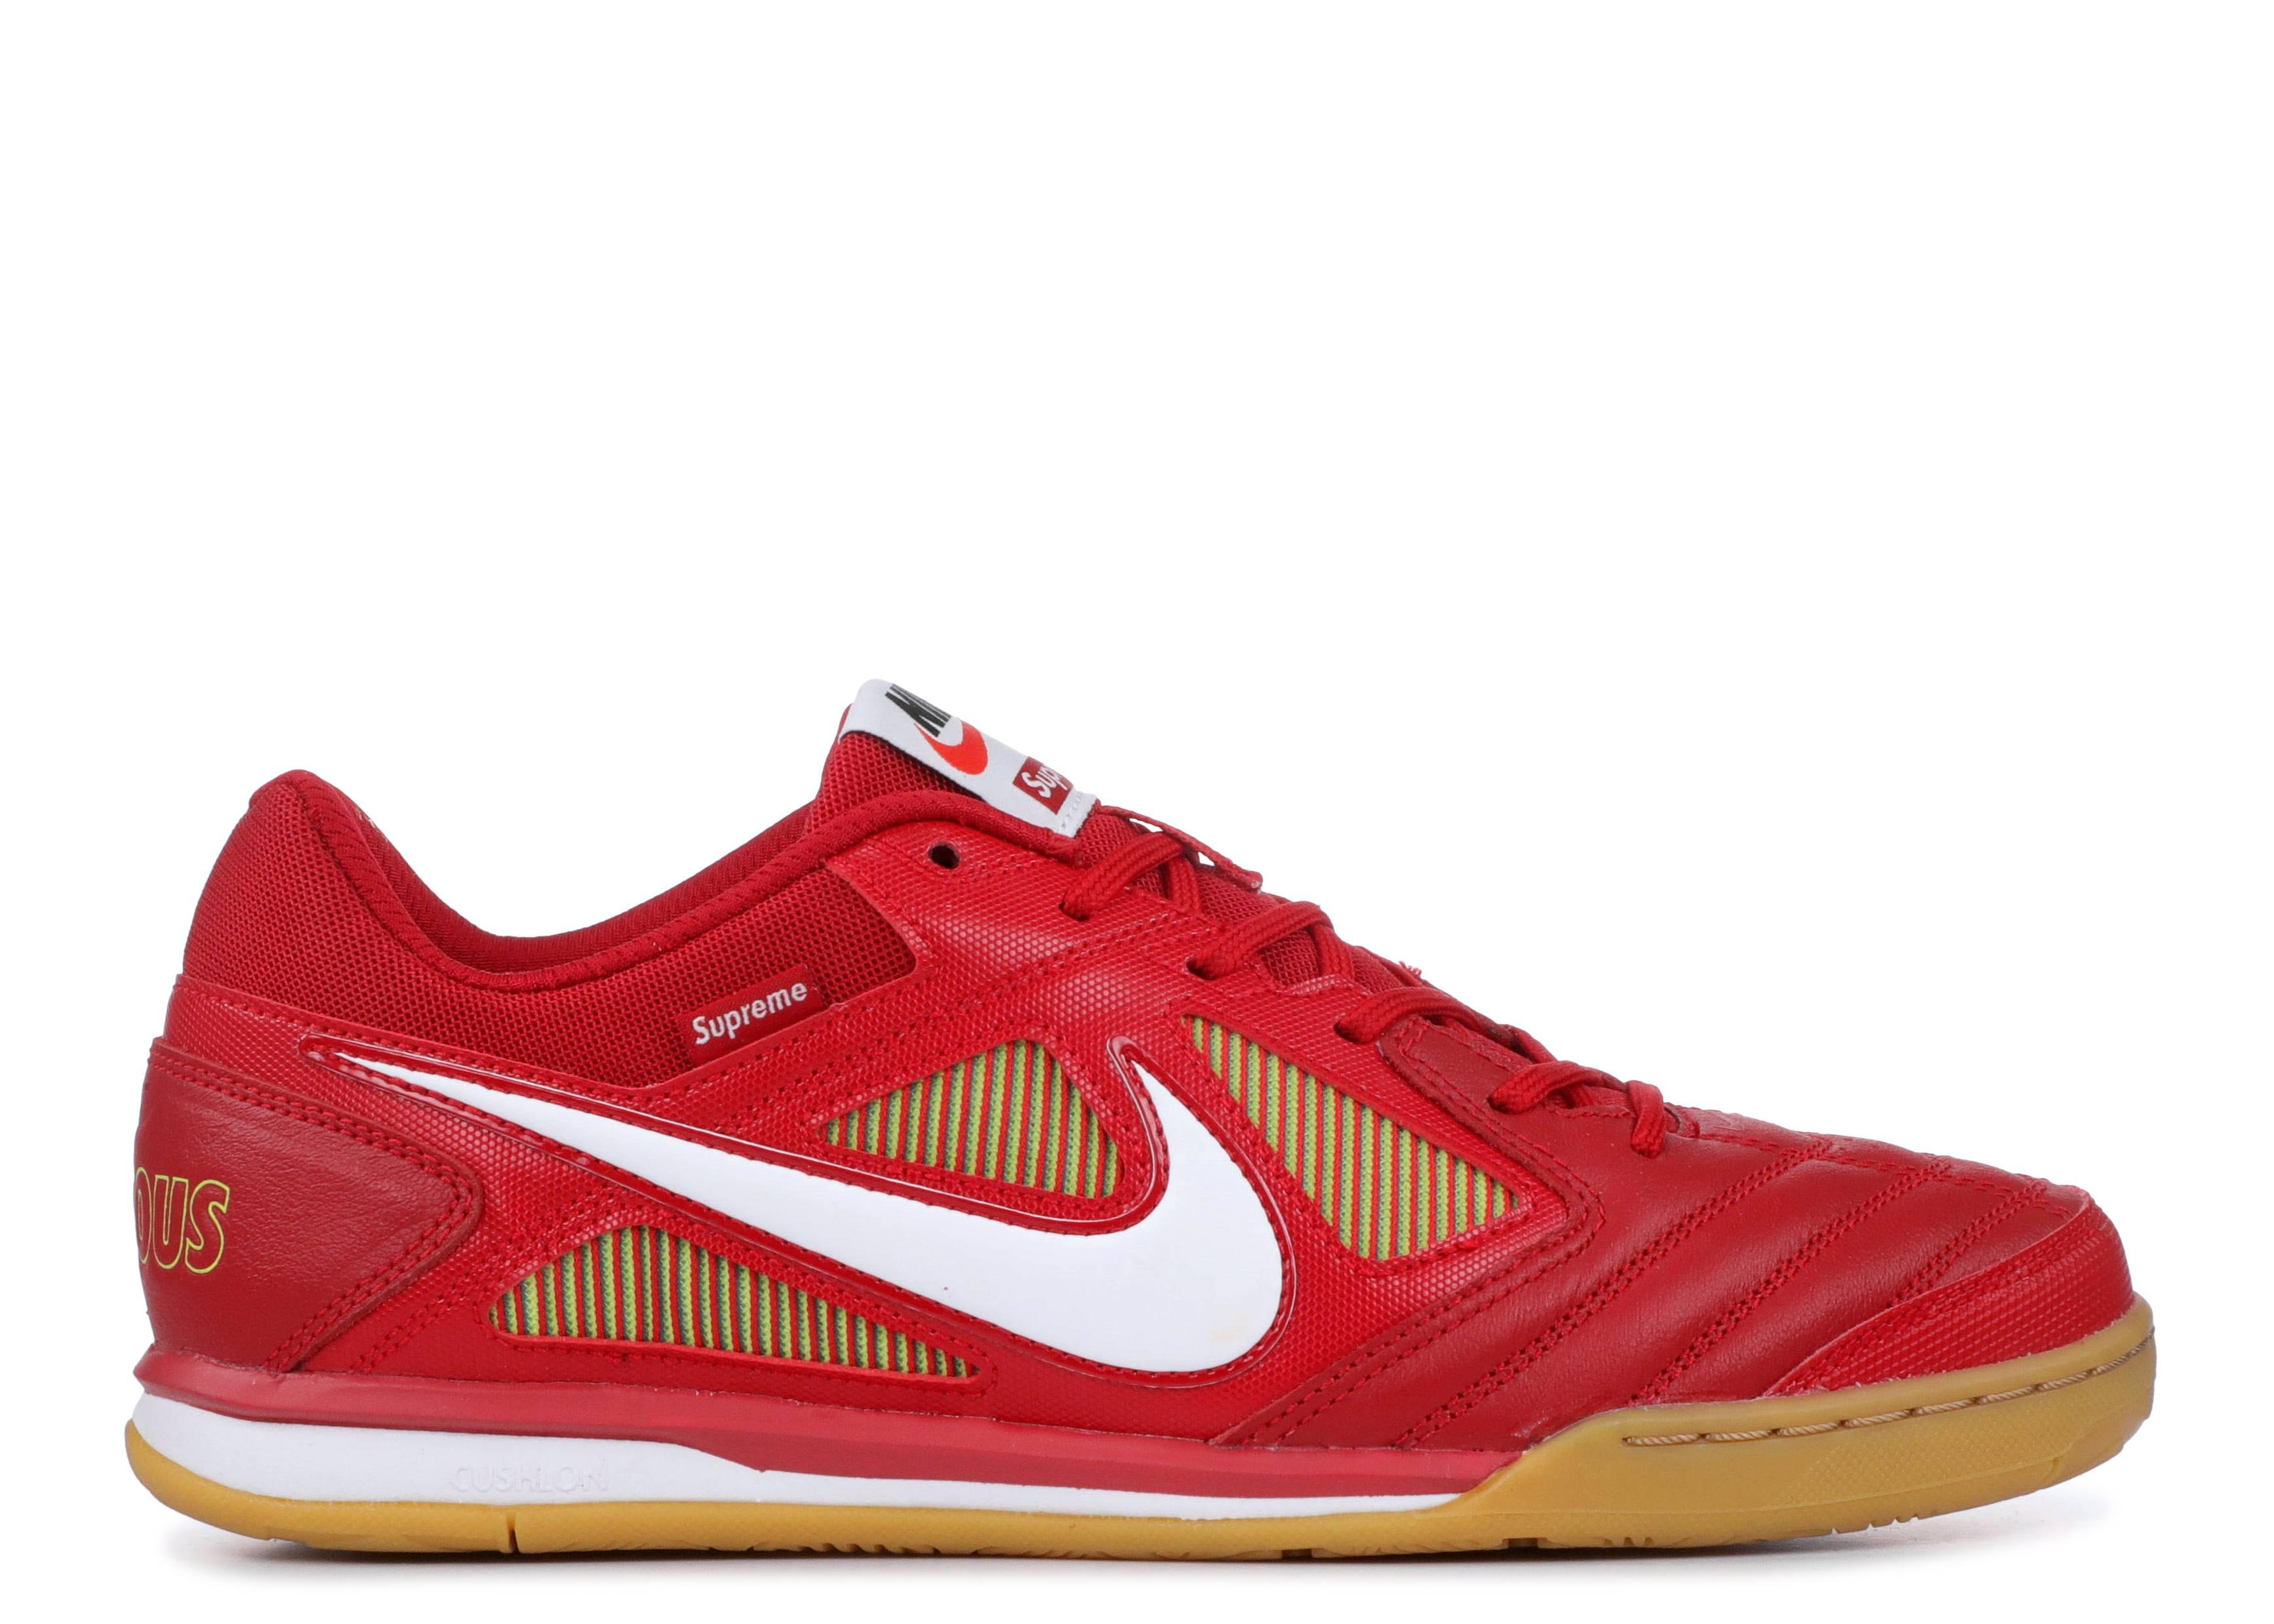 new concept 074ad 63db4 Nike SB Gato Qs